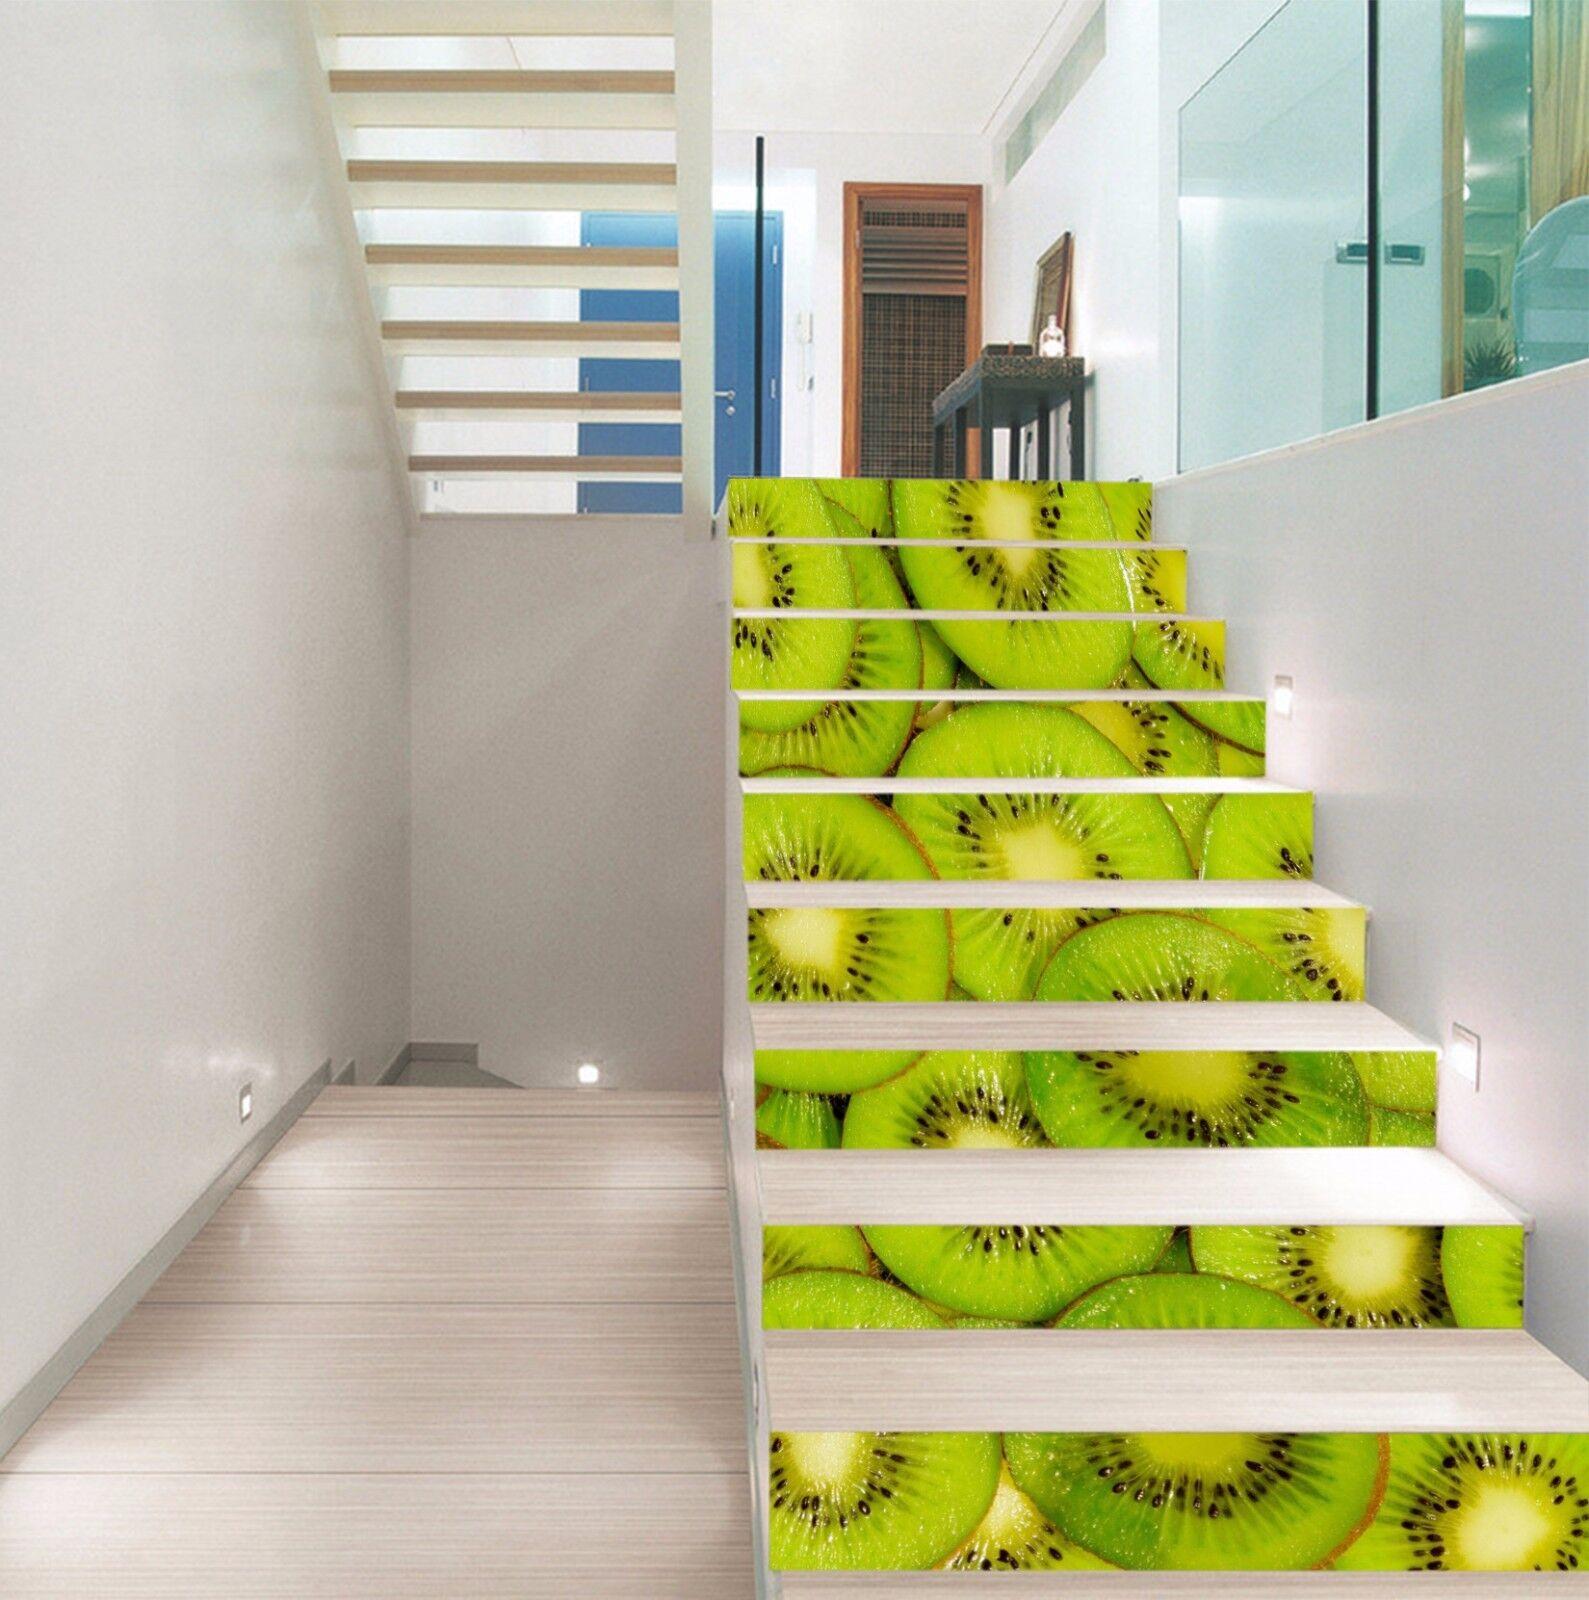 3D Grün kiwifruit4 Stair Risers Decoration Photo Mural Vinyl Decal Wallpaper UK